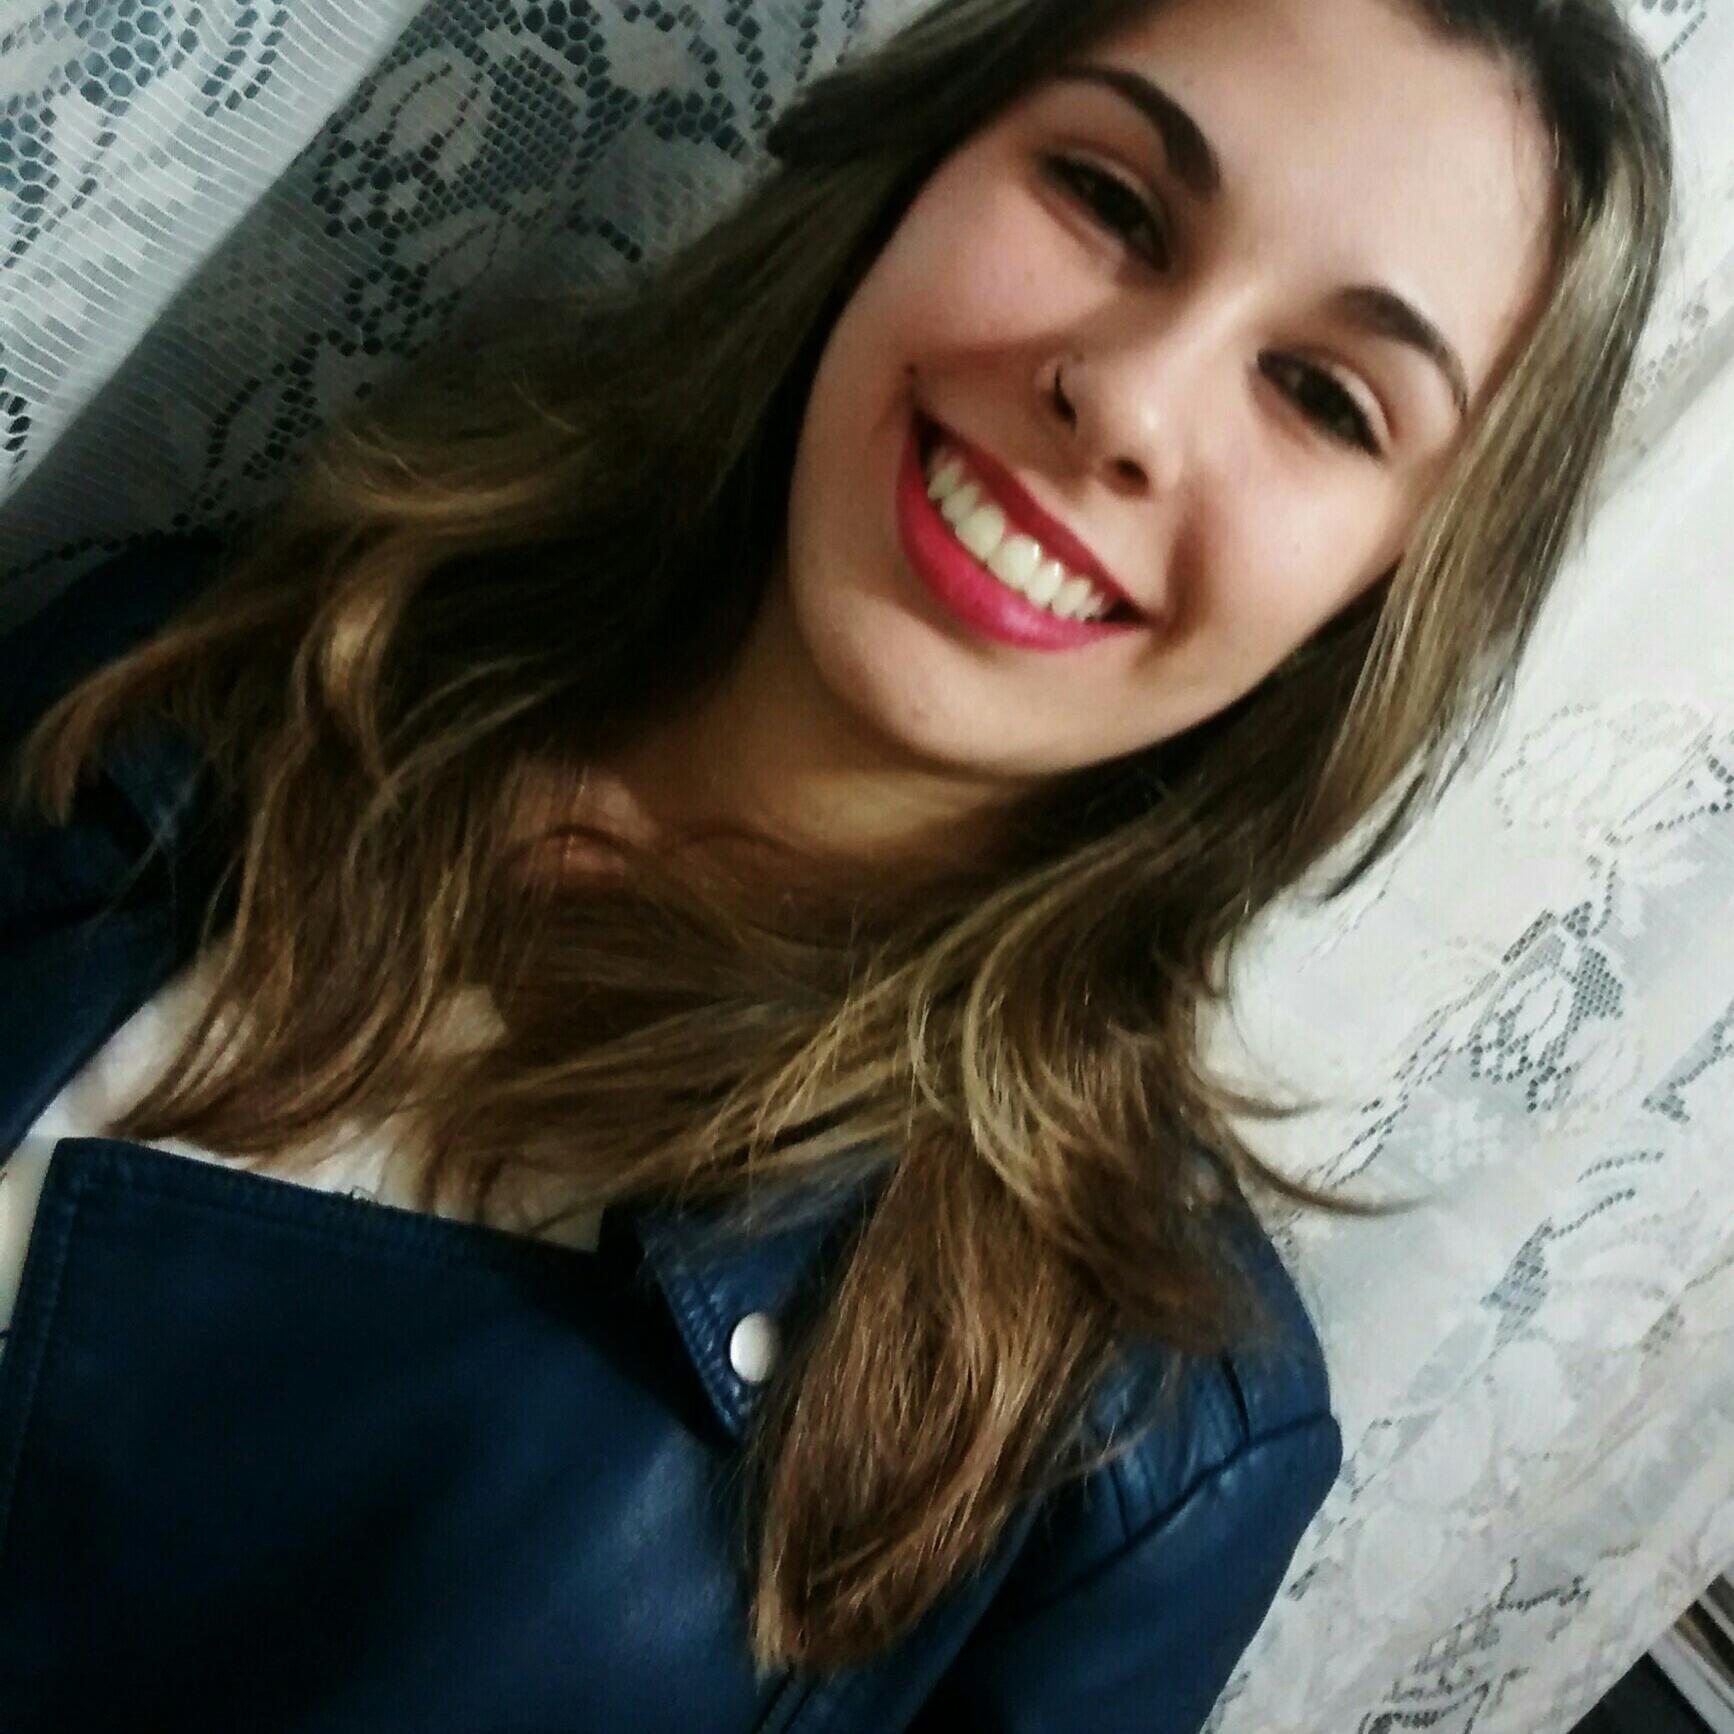 Beatriz Regis